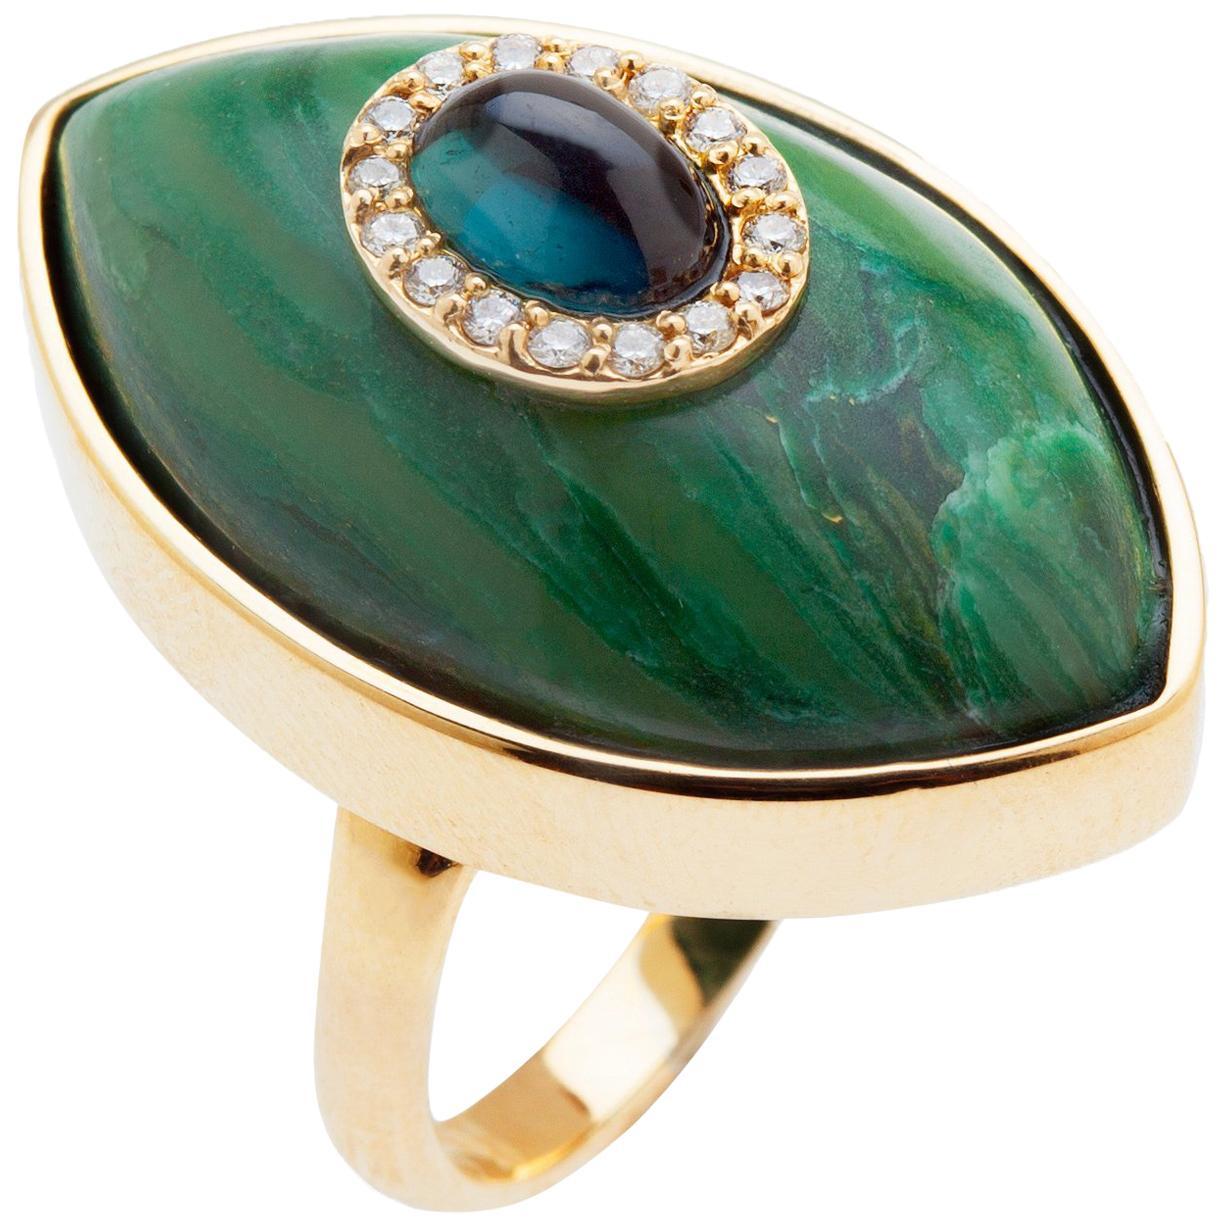 Marlo Laz Green Tourmaline Brazilian Jade 14K Yellow Gold Evil Eye Cocktail Ring